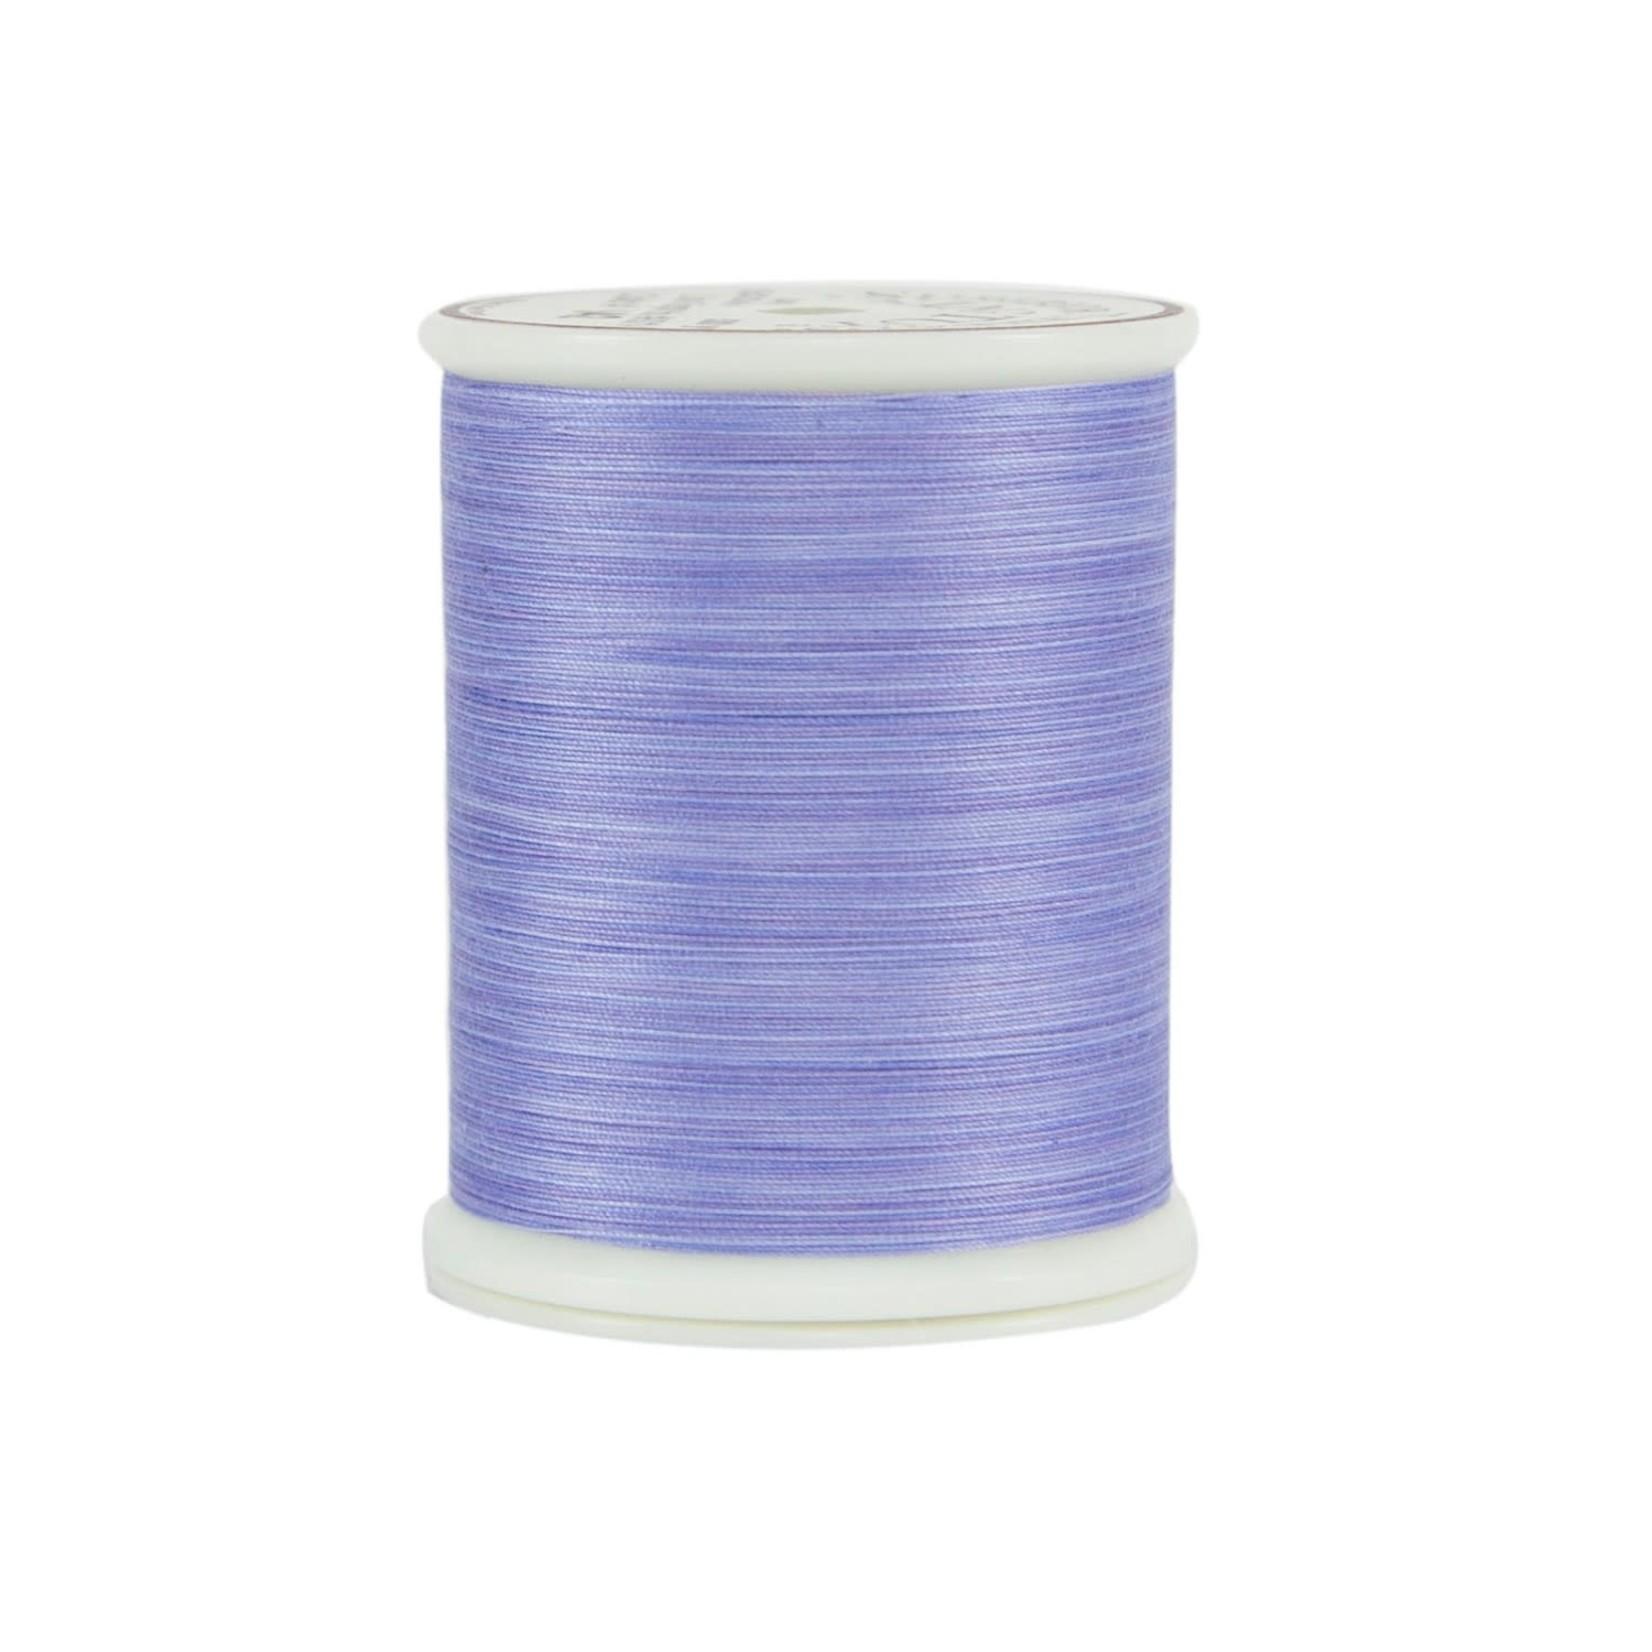 Superior Threads King Tut - #40 - 457 m - 0942 Wisteria Lane